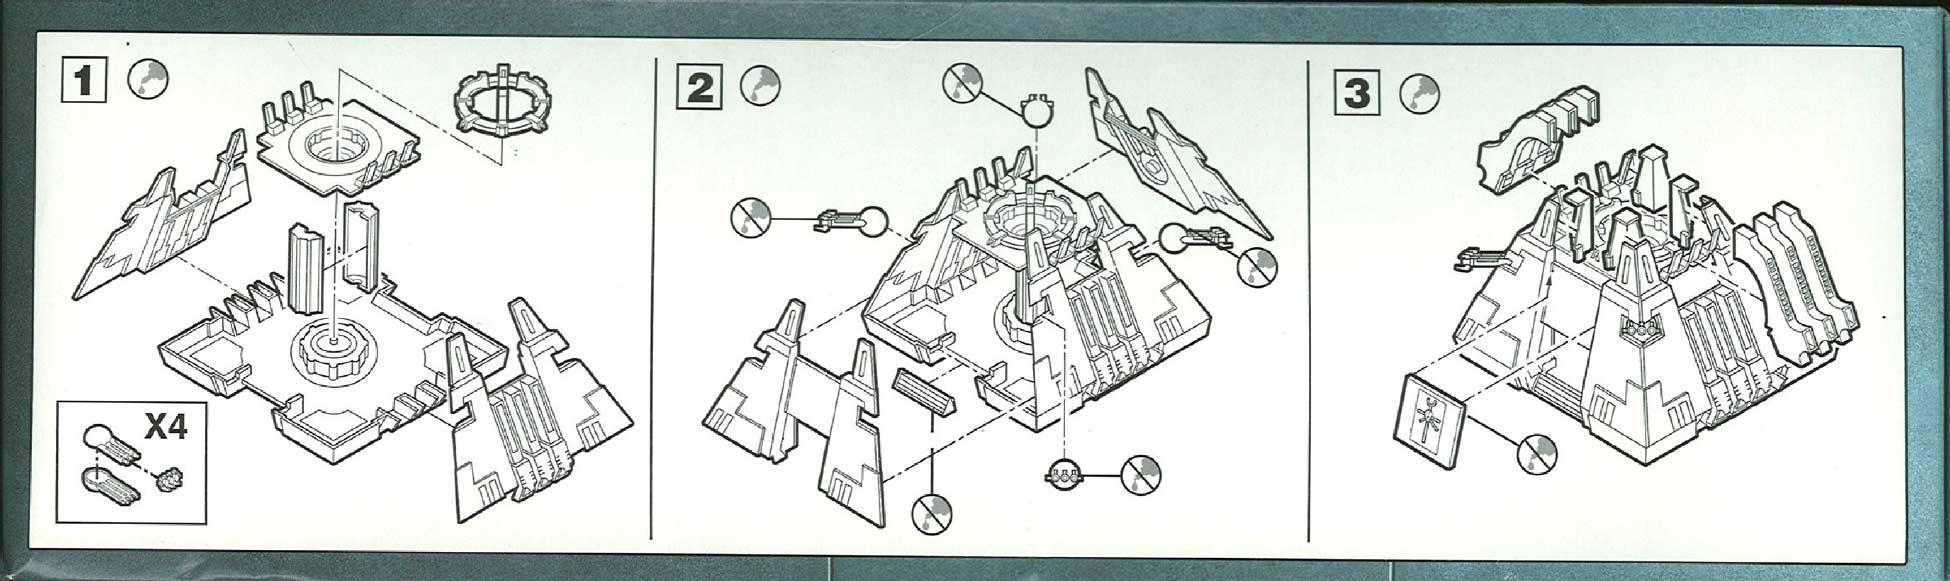 Côté dessus du packaging du Monolithe Nécron (Warhammer 40.000)